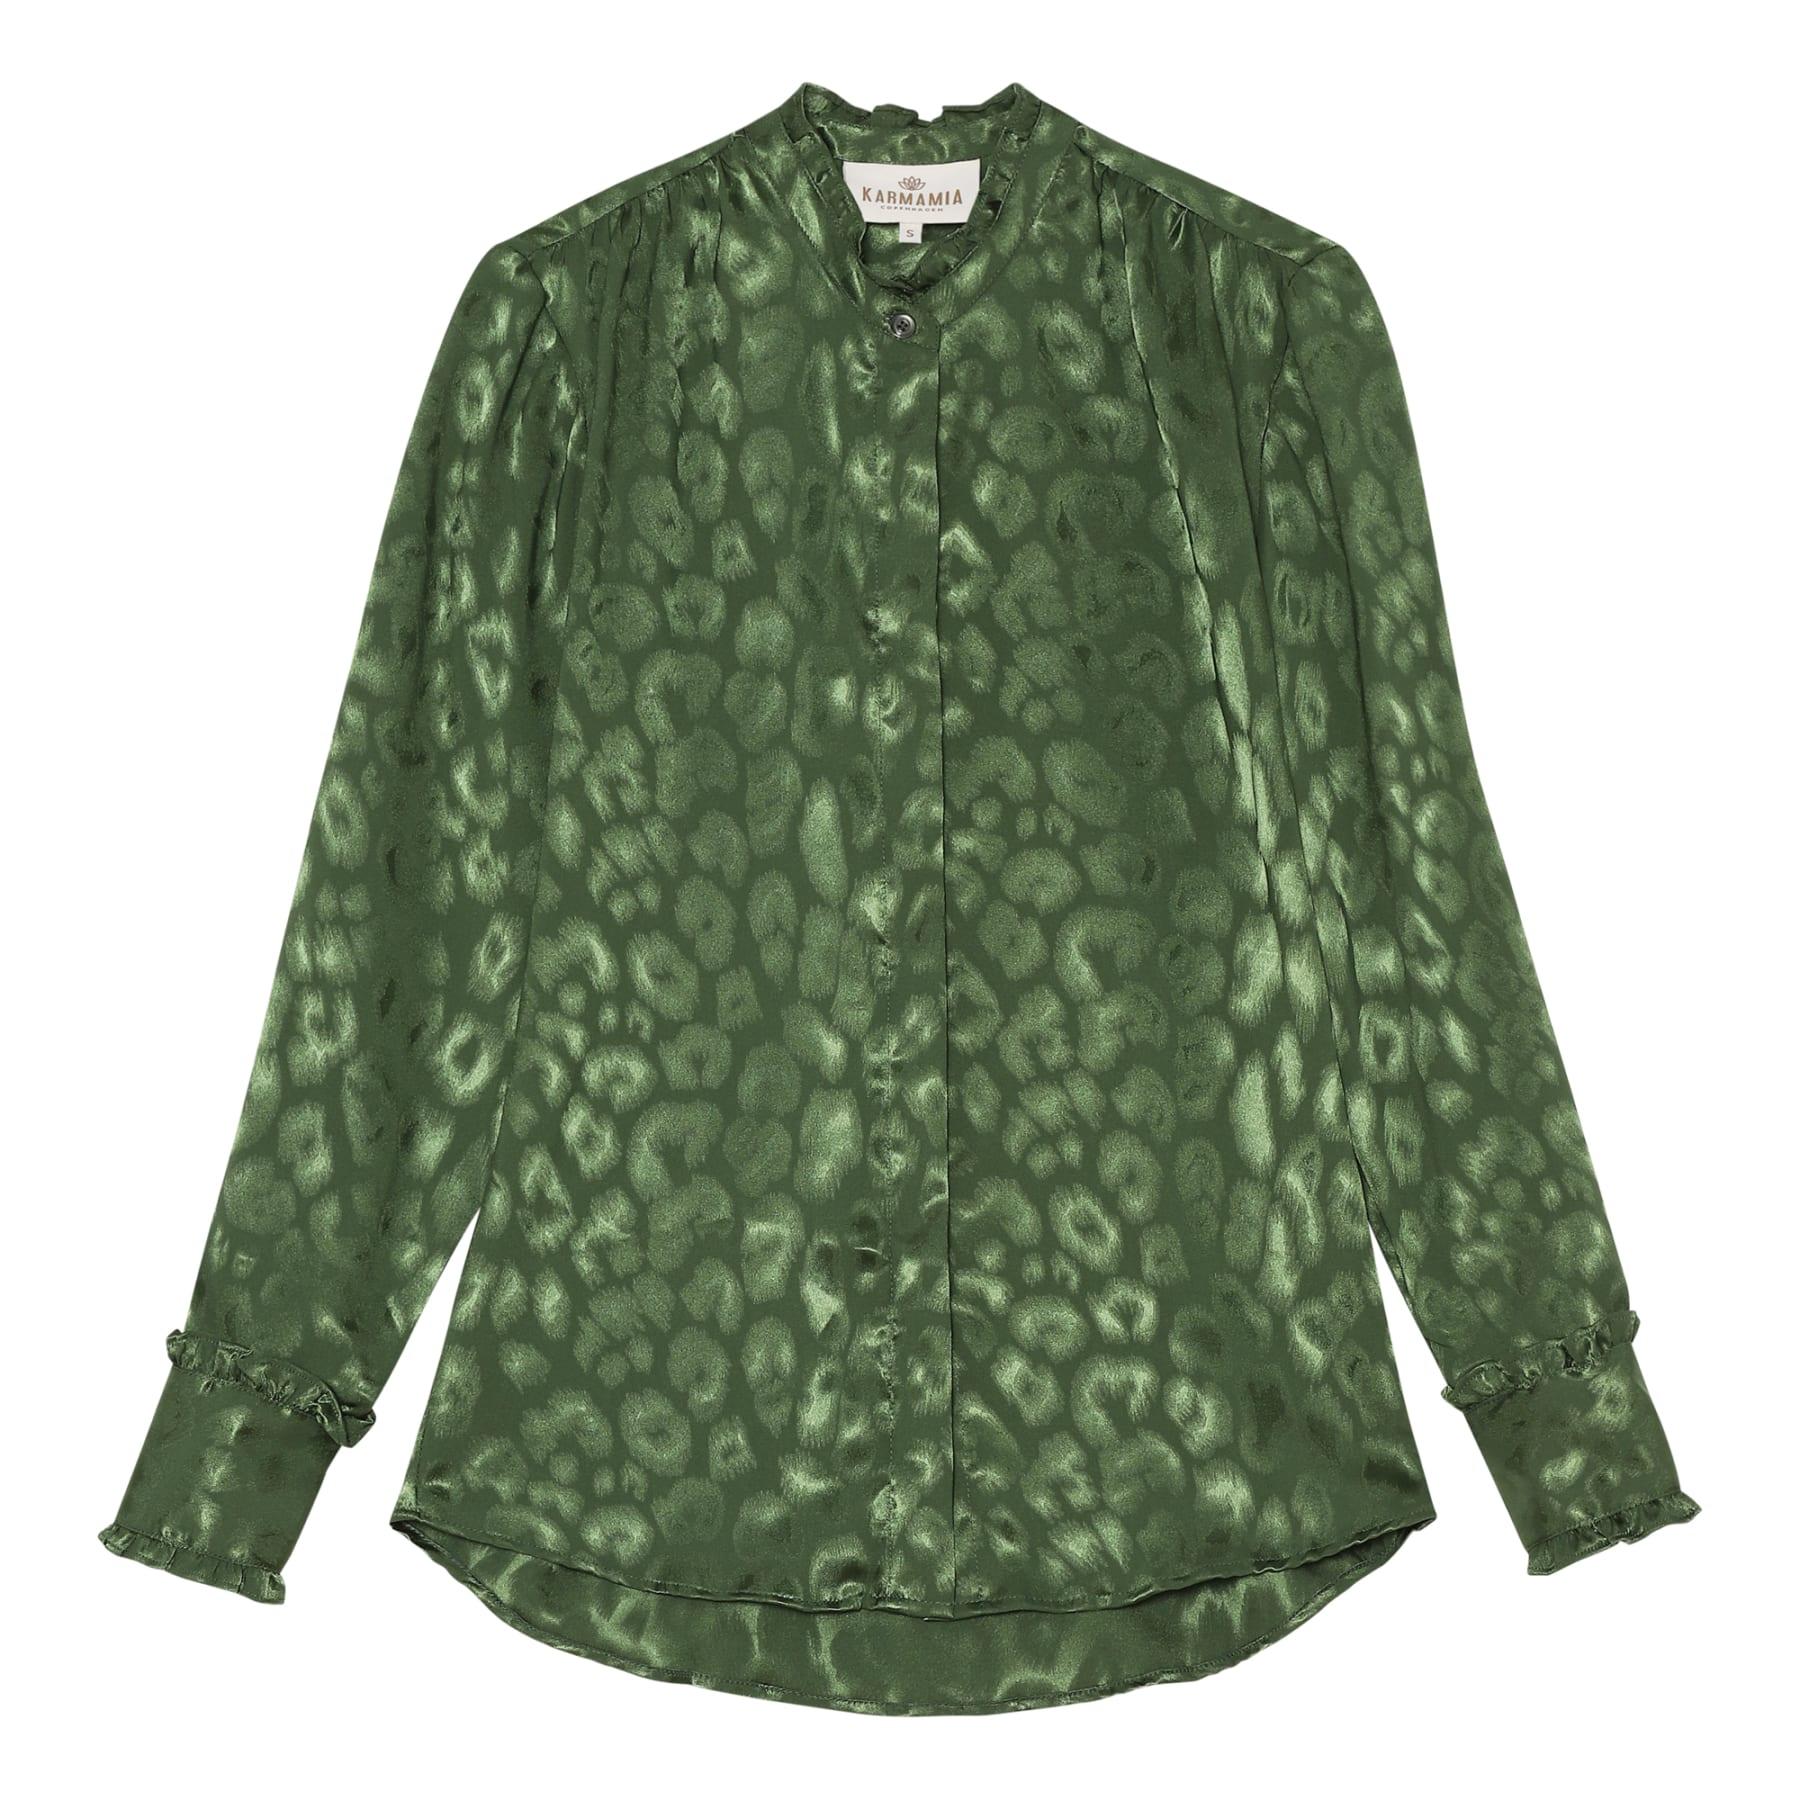 Trinity Shirt - Cactus Leo Jacquard KARMAMIA IMAGE BY ME